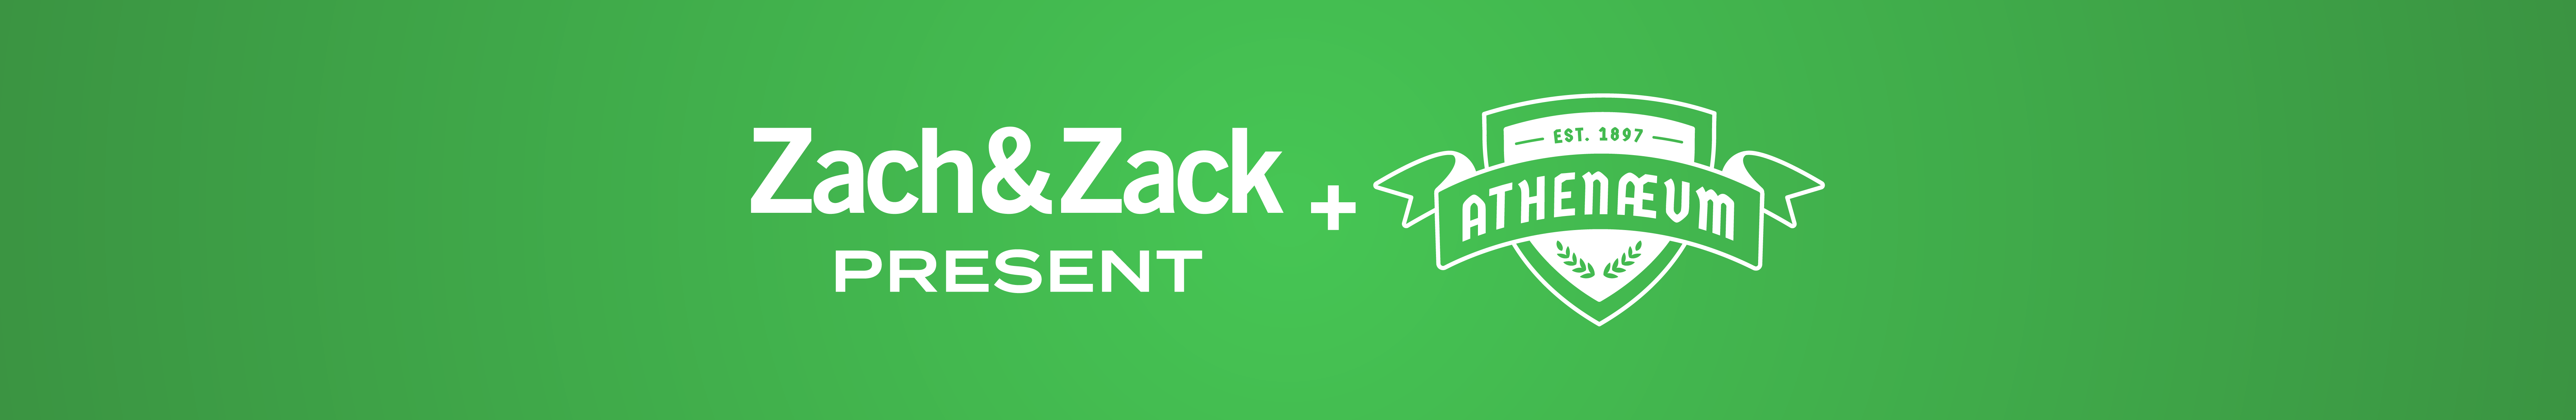 Zach and Zack